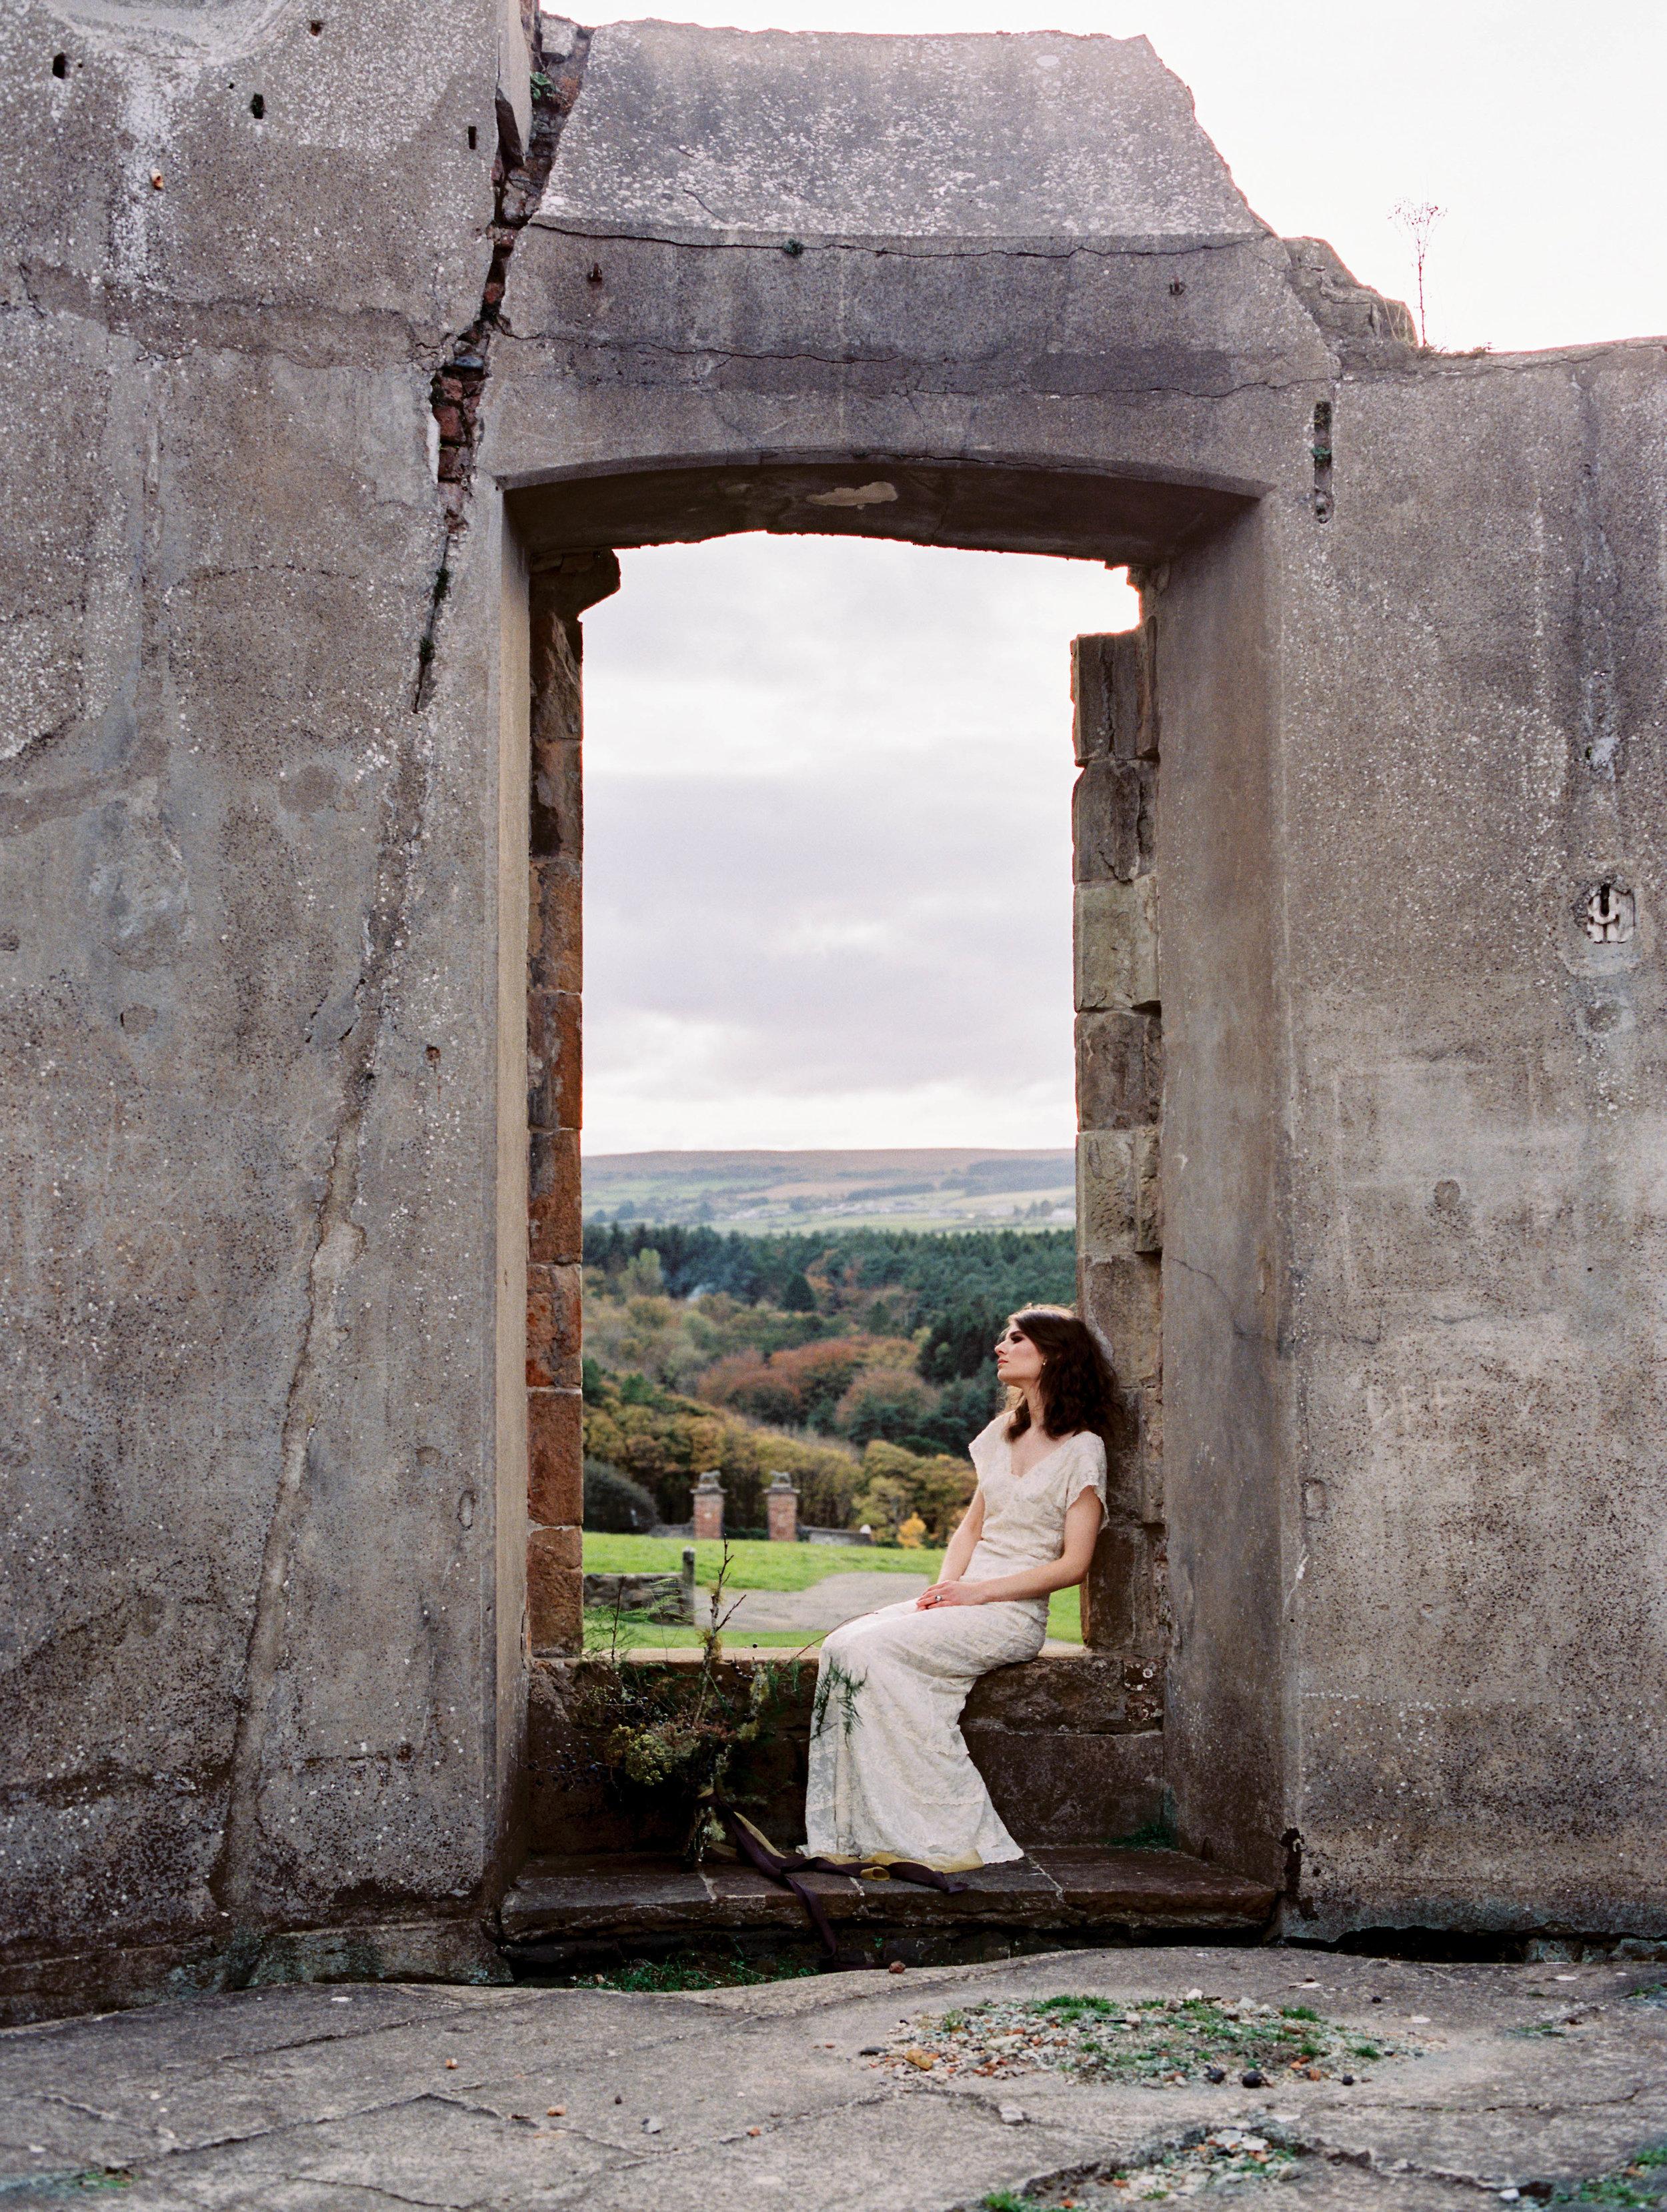 Eli Defaria Photography Northen Ireland Wedding Editorial Inspiration 2018 113.jpg